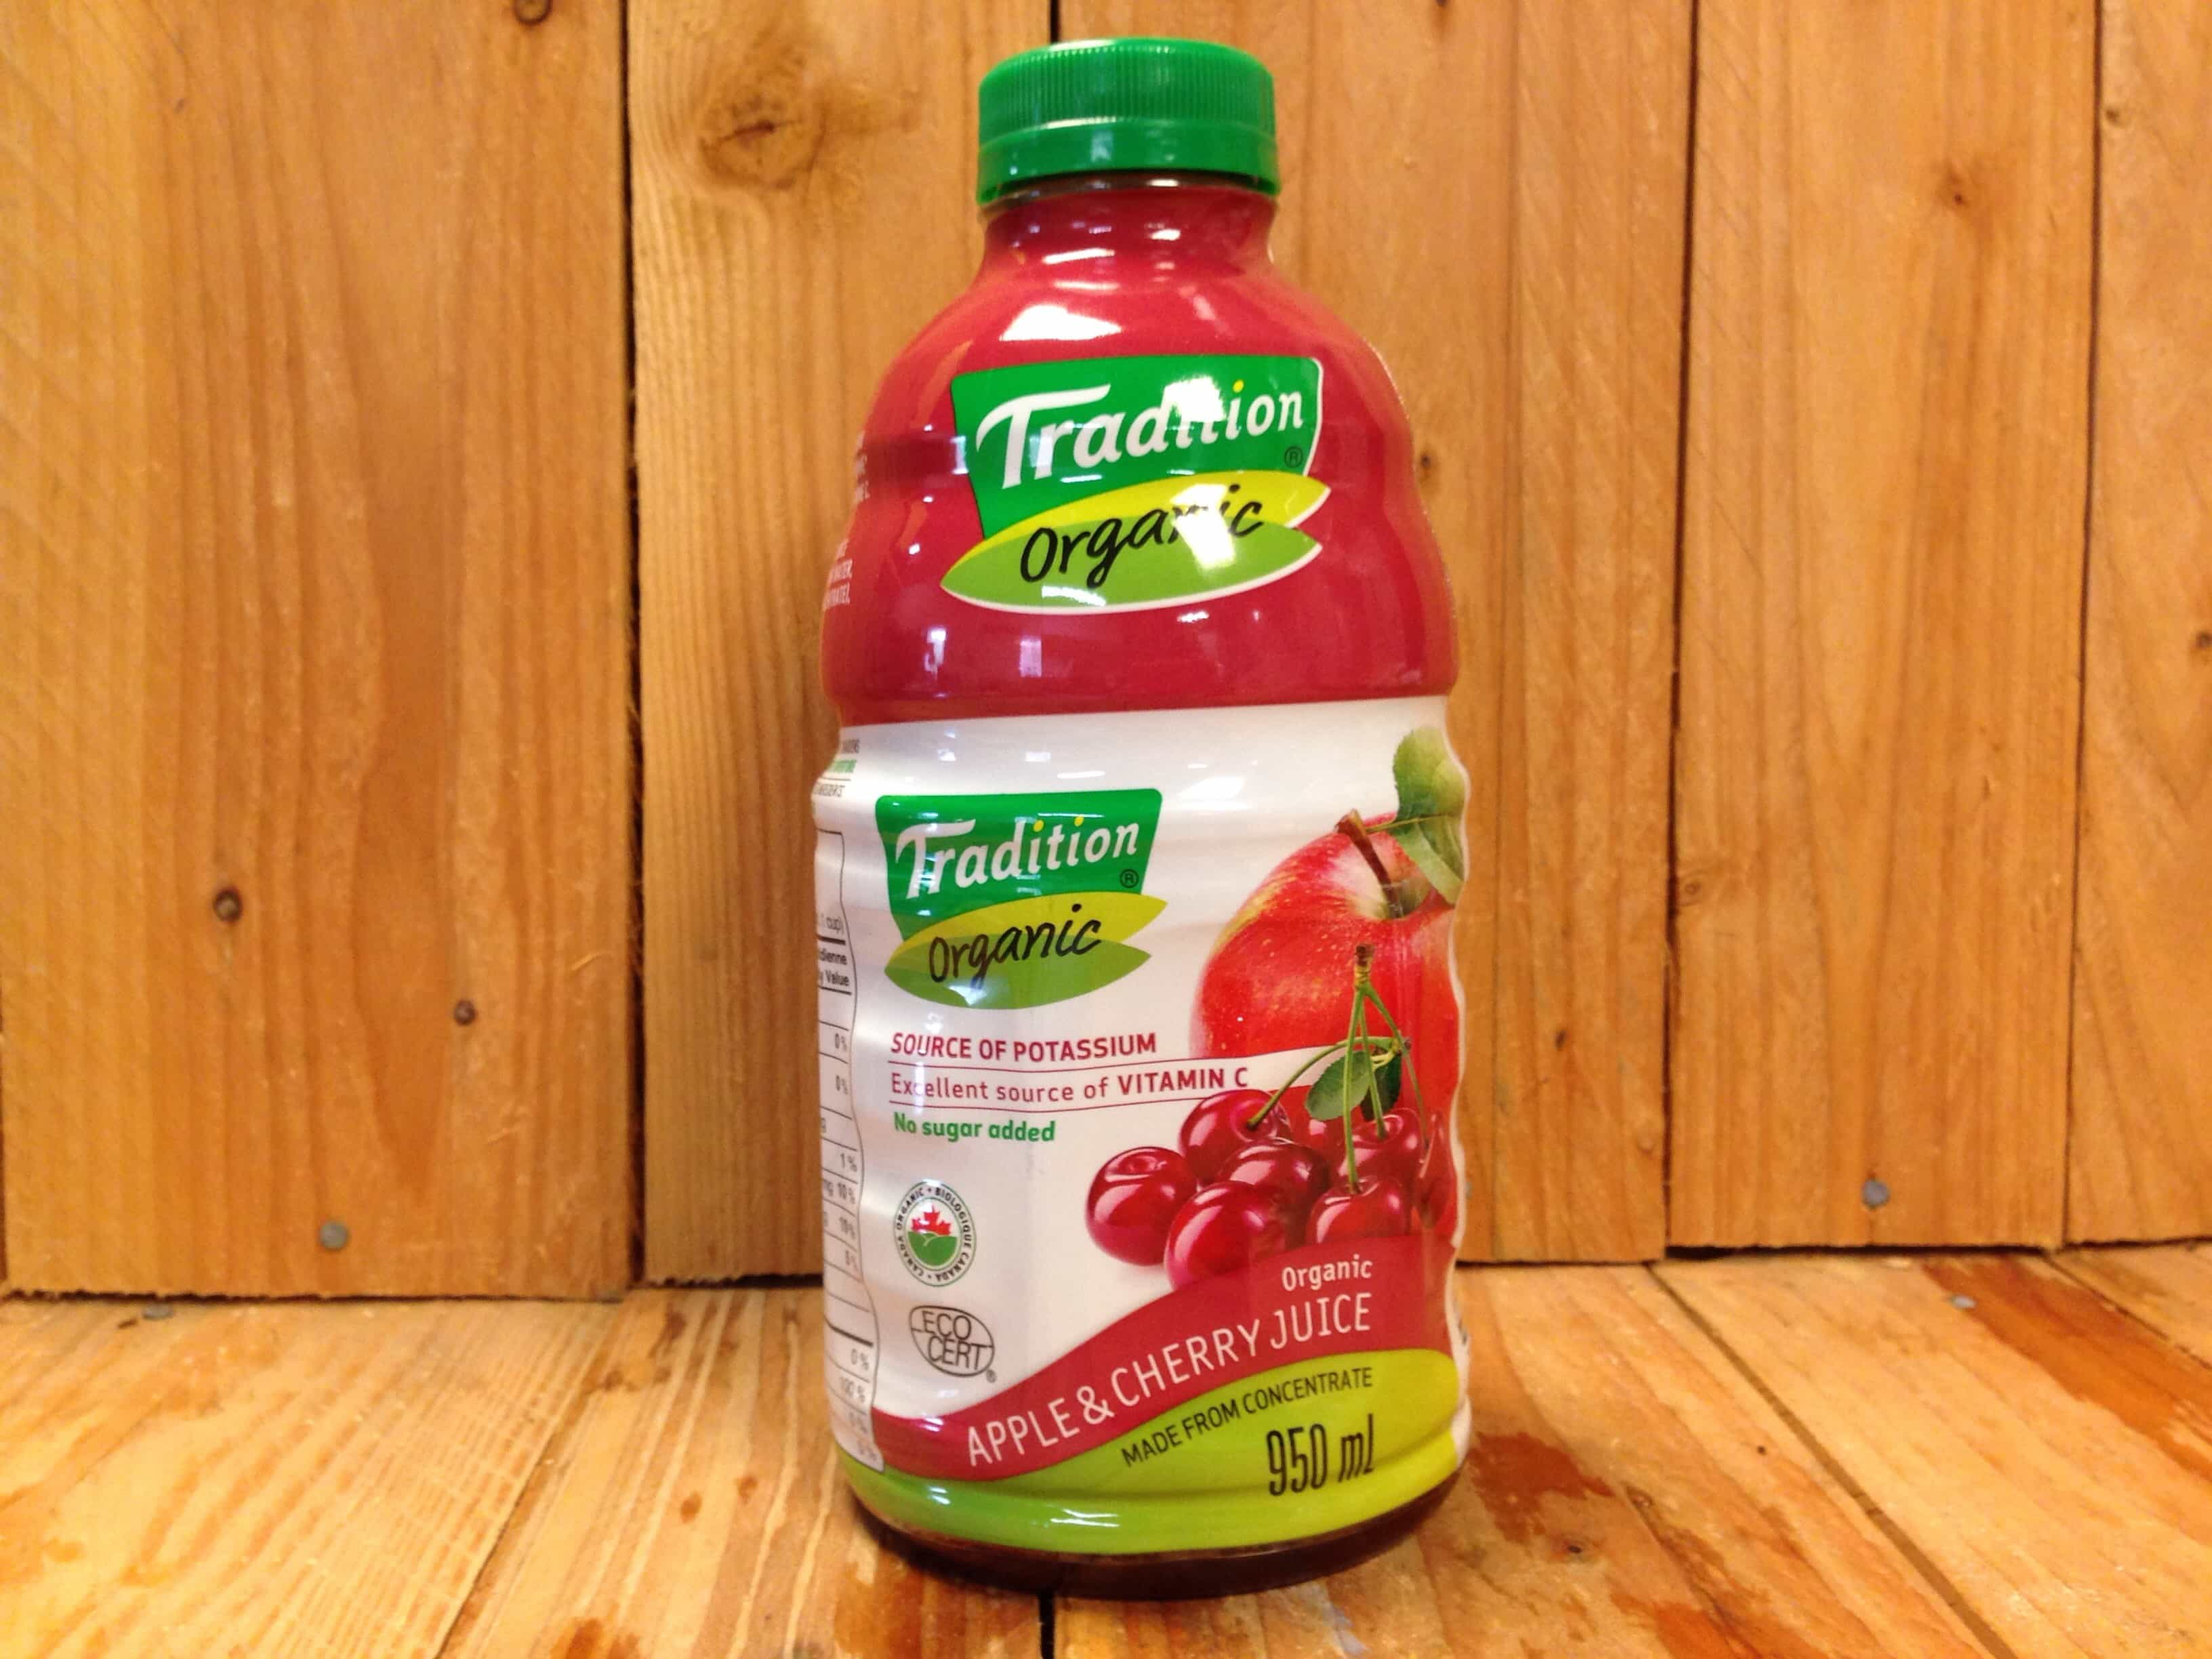 Tradition – Apple & Cherry Juice (950ml Jug)